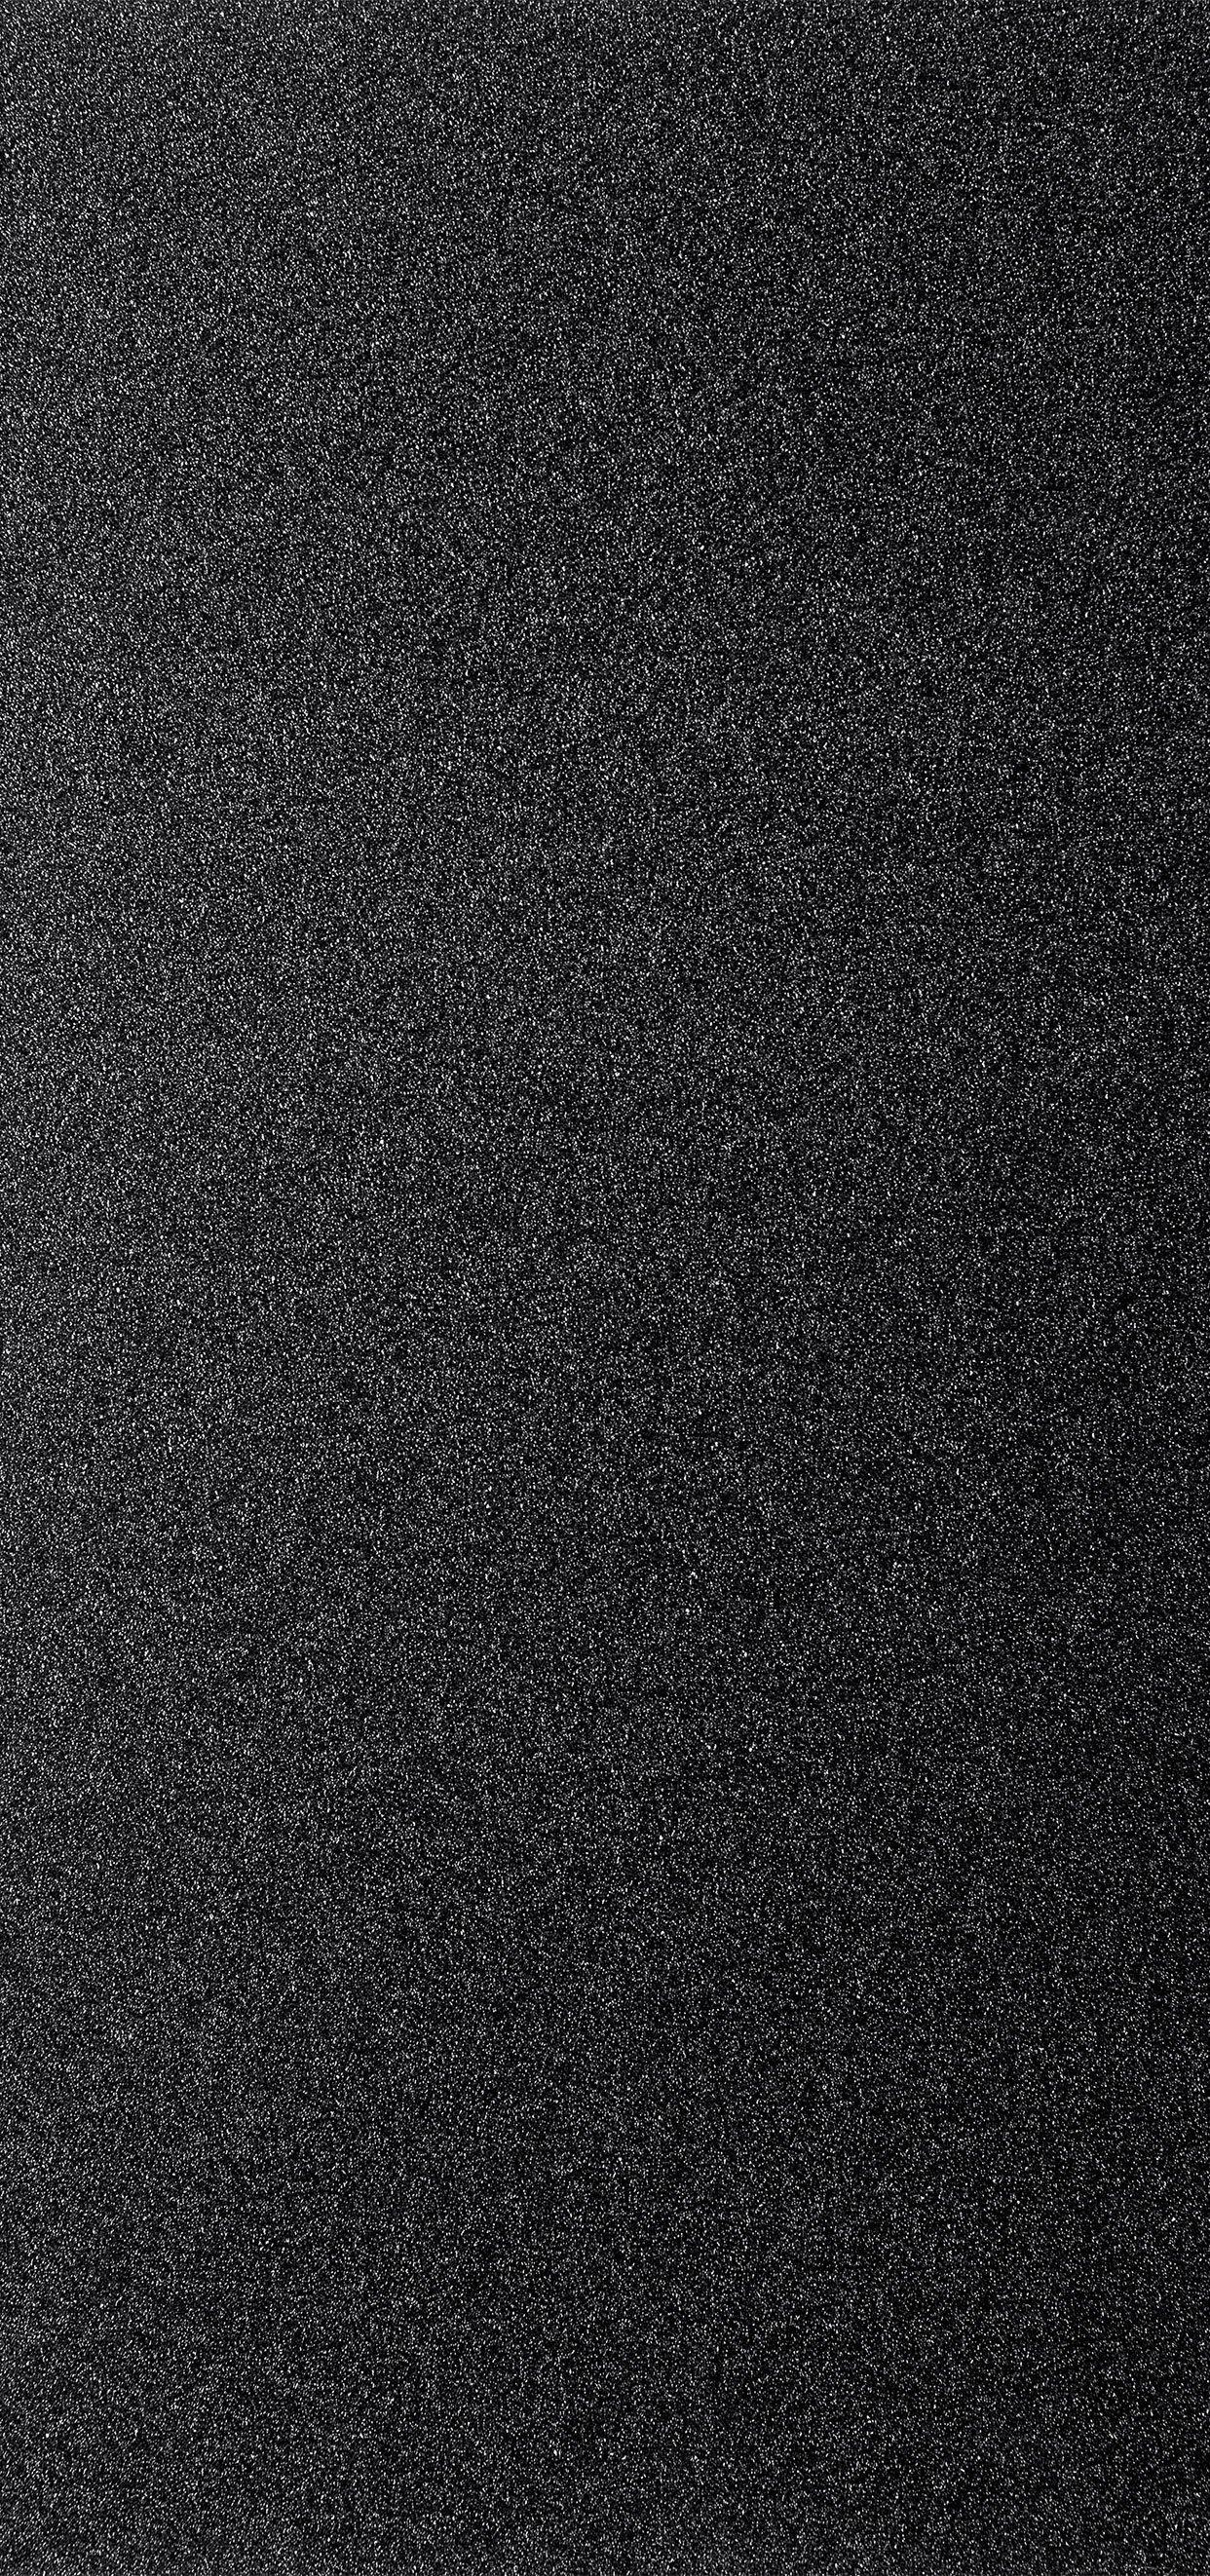 Black-Glittery-iPhone-X-Plus-Background